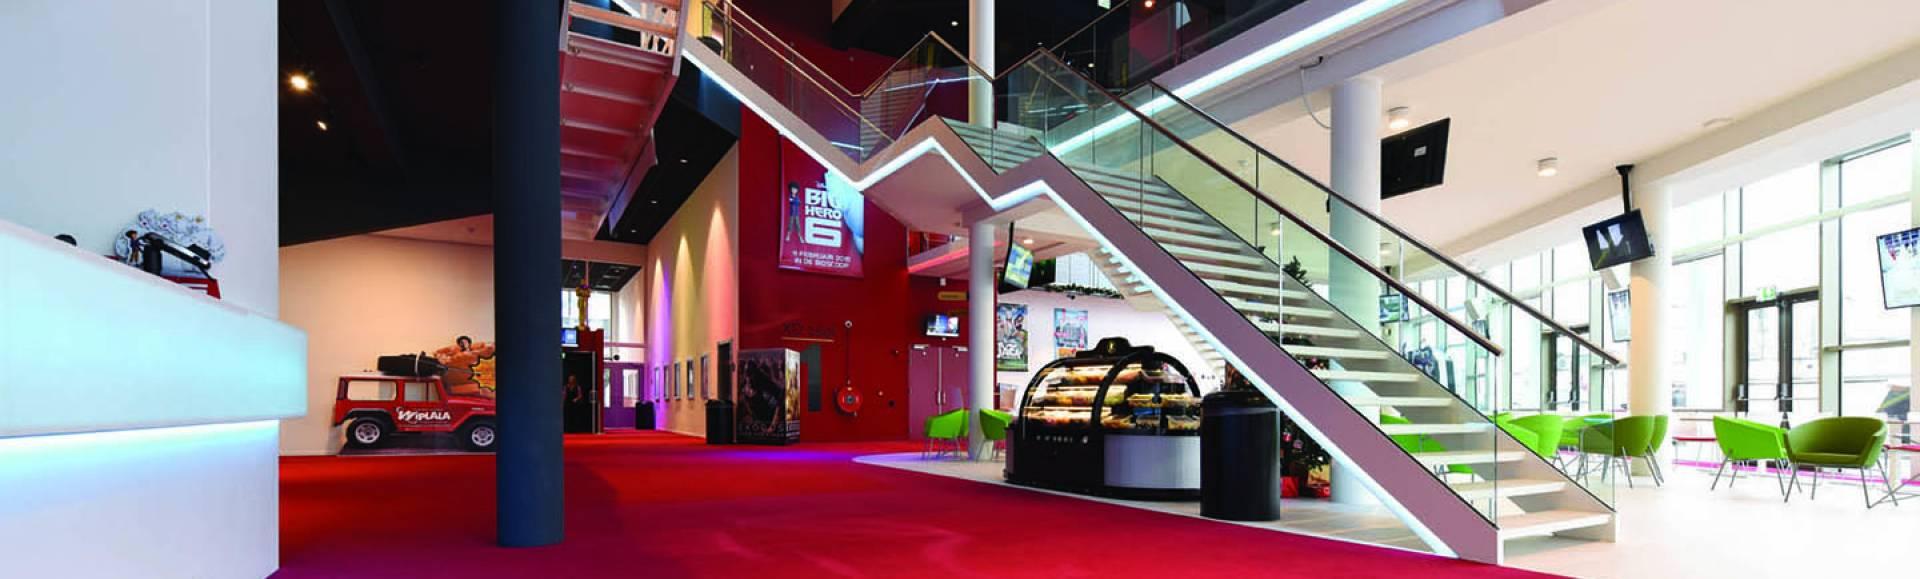 Inspiration Grande Reference hotel office cinema le design concept constellation